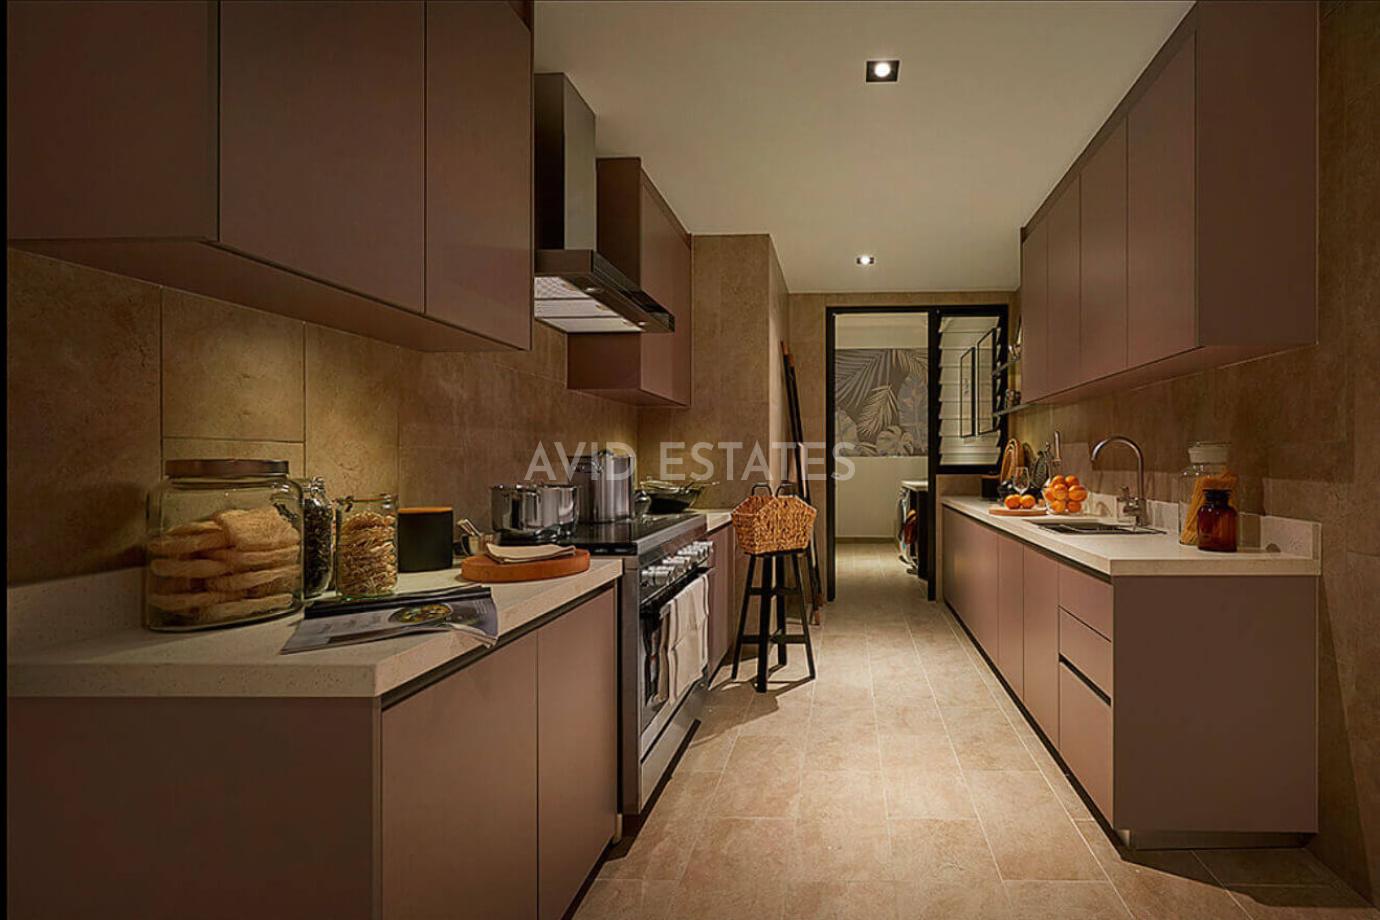 Residensi Ampang Tengah 6,Kuala Lumpur, 4 Bedrooms Bedrooms, ,5 BathroomsBathrooms,Condominium / Serviced Residence,For Sale,Ampang,2219